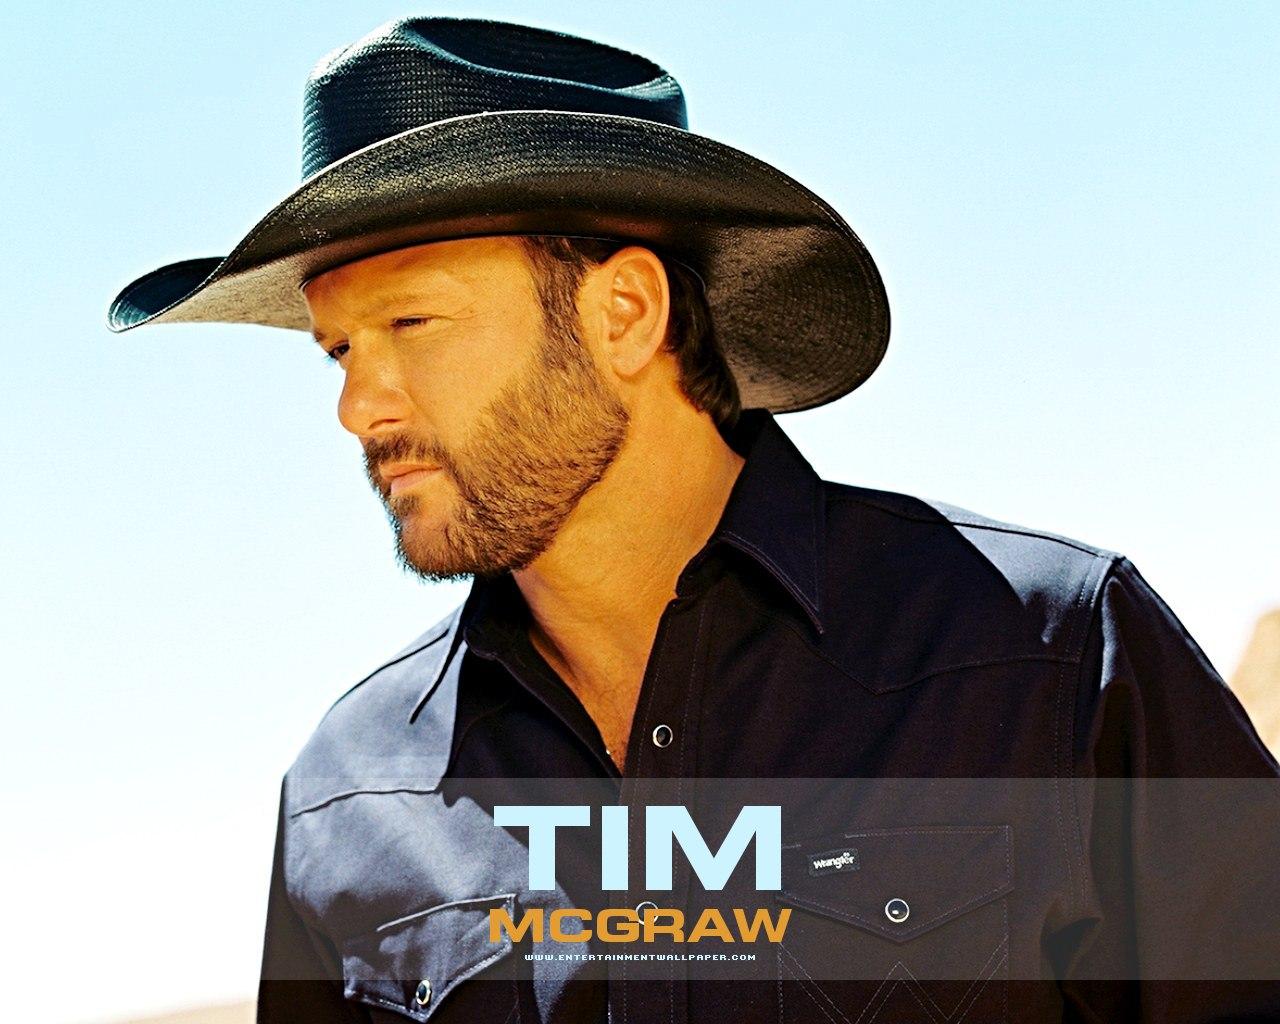 Tim McGraw Wallpaper   40009617 1280x1024 Desktop Download page 1280x1024